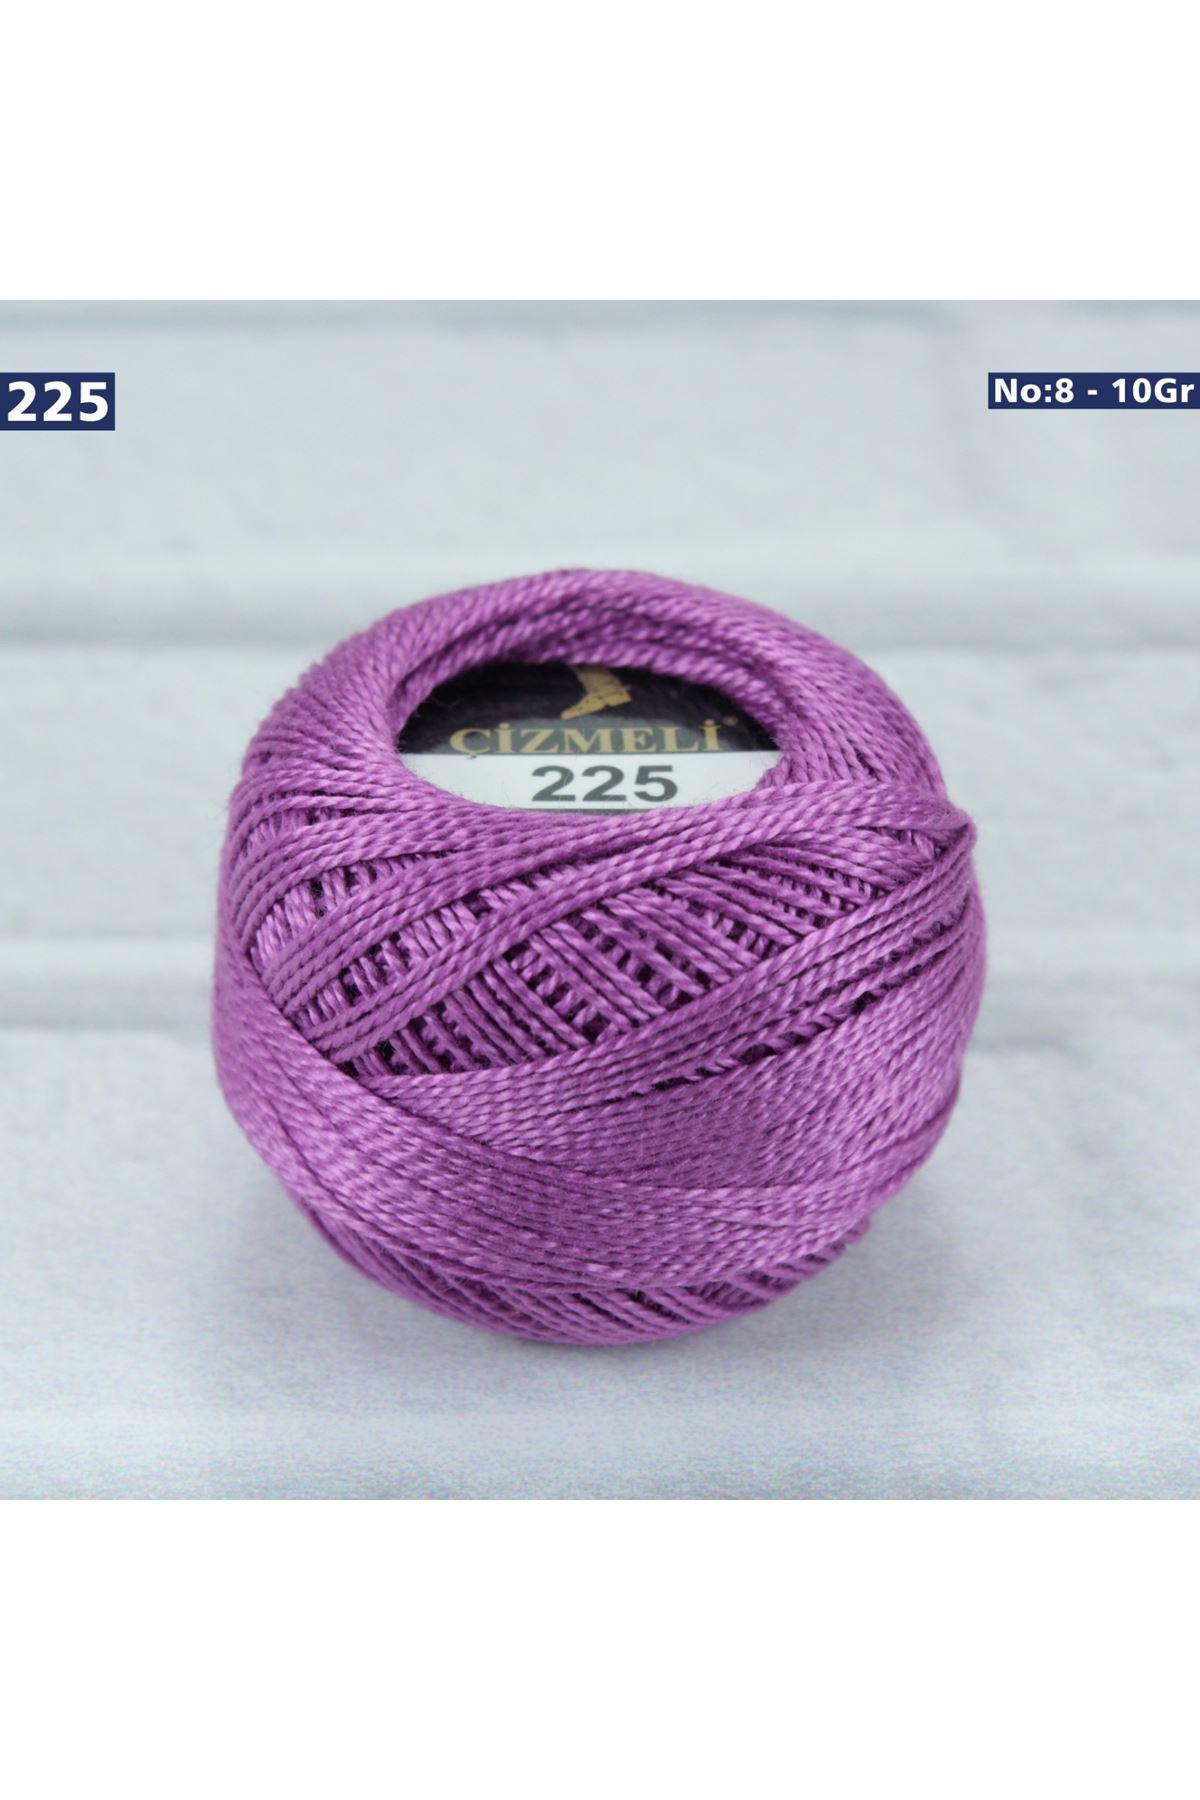 Çizmeli Cotton Perle Nakış İpliği No: 225